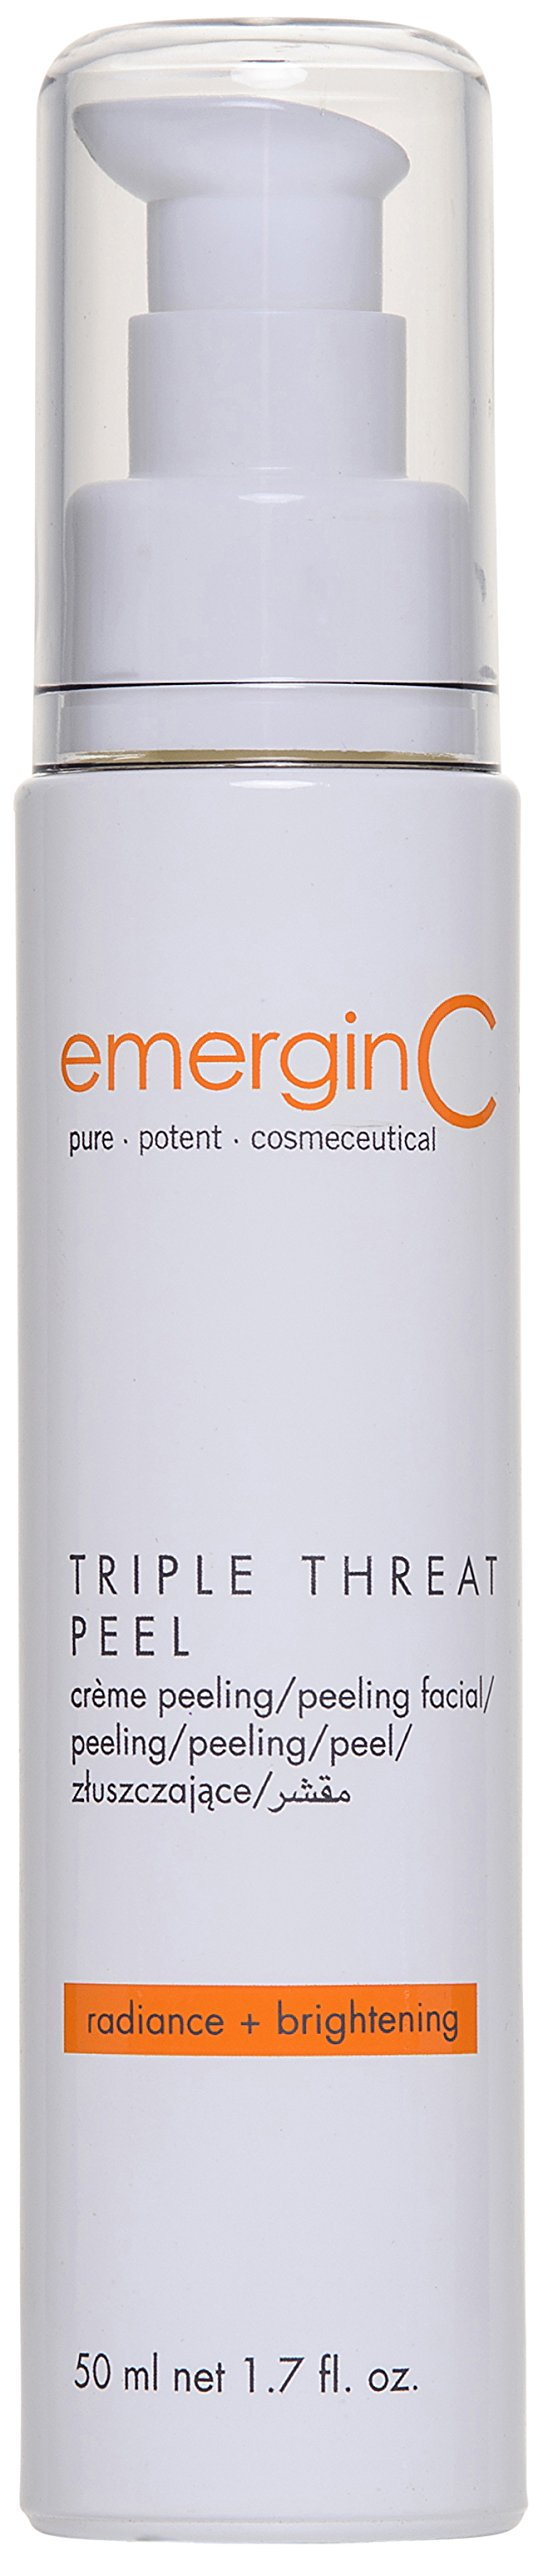 emerginC - Triple-Threat Facial Peel, Glycolic Acid + Retinol Exfoliant to Address Uneven Tone + Texture (1.6oz / 50 ml)